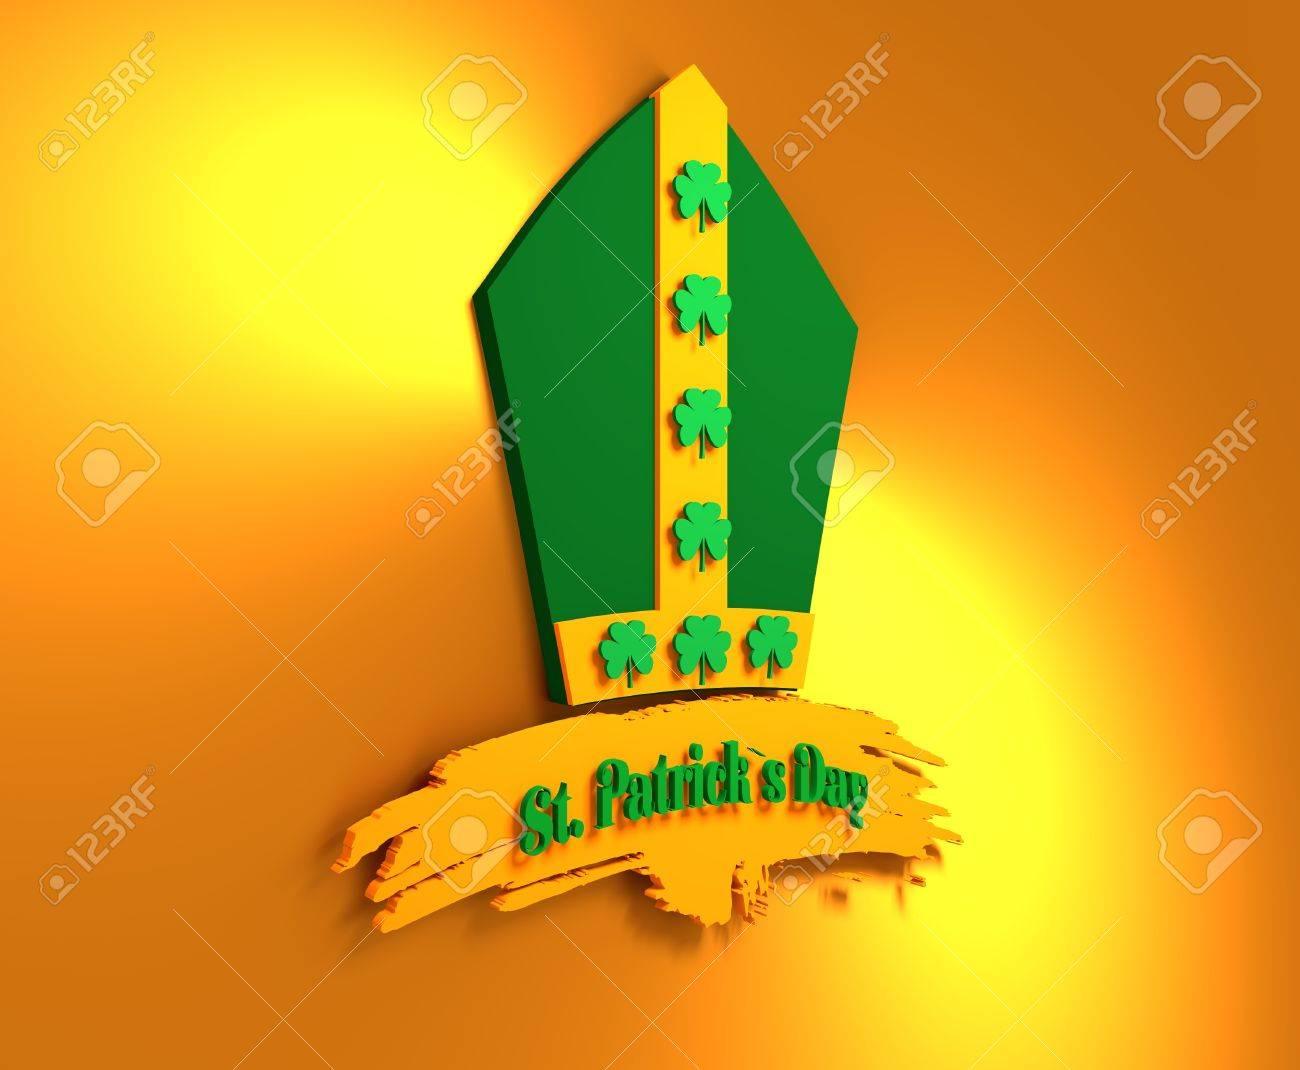 st patricks day greeting card template bishop hat with shamrock